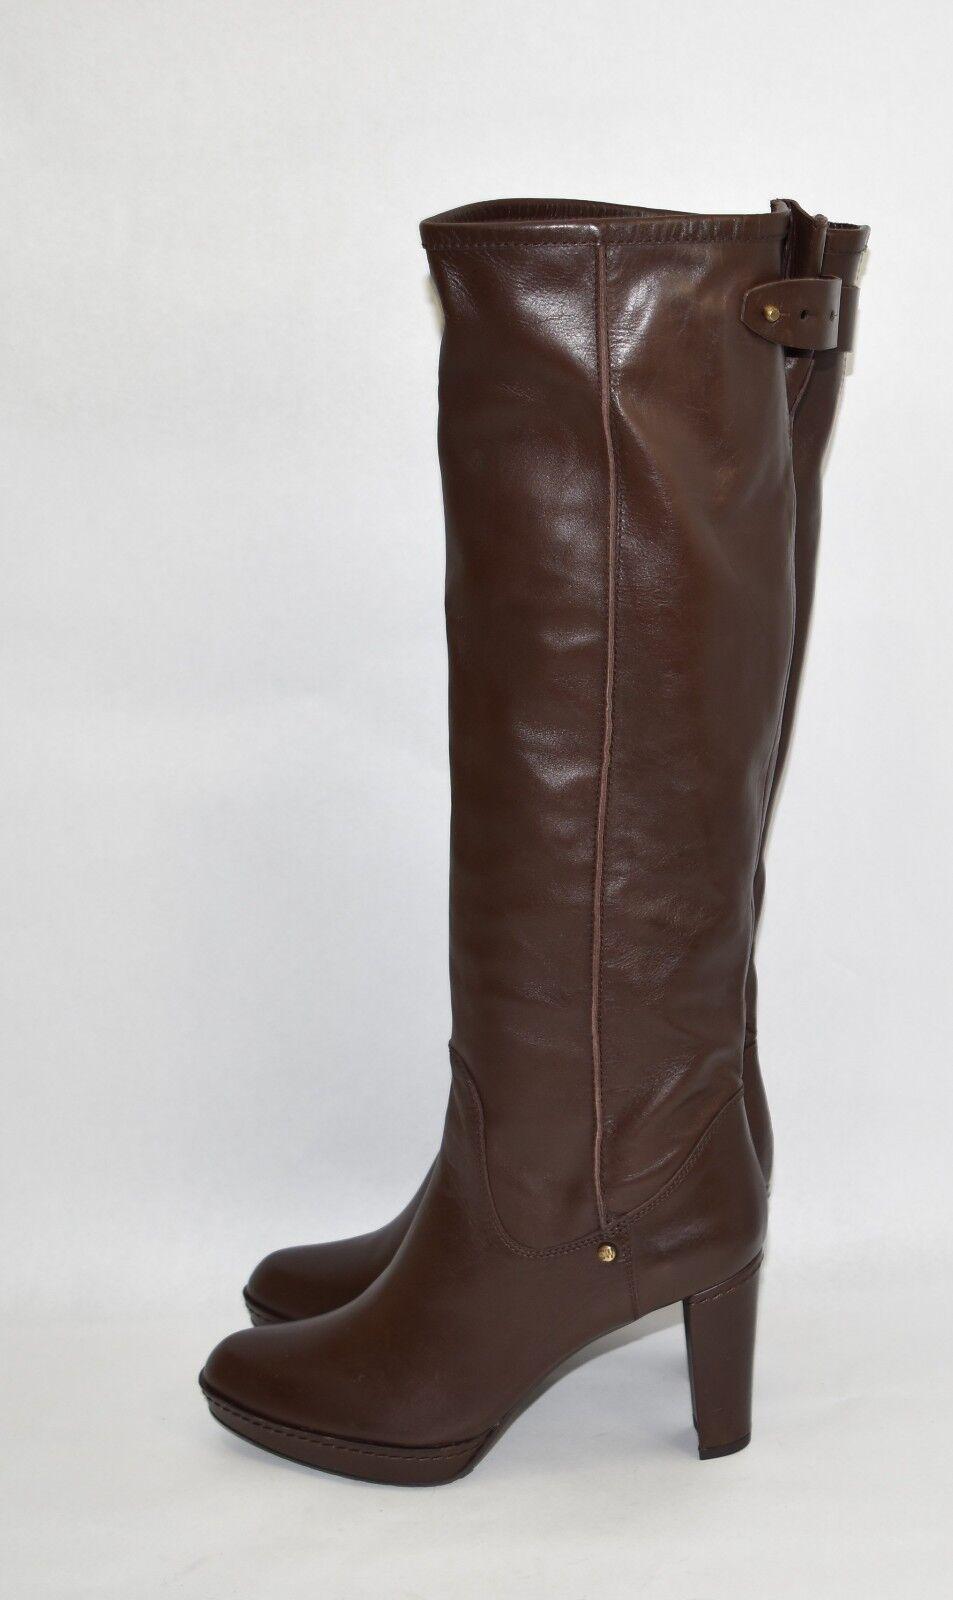 New Stuart Weitzman 'Gentry' Almond Toe Platform Brown Boot Size 10